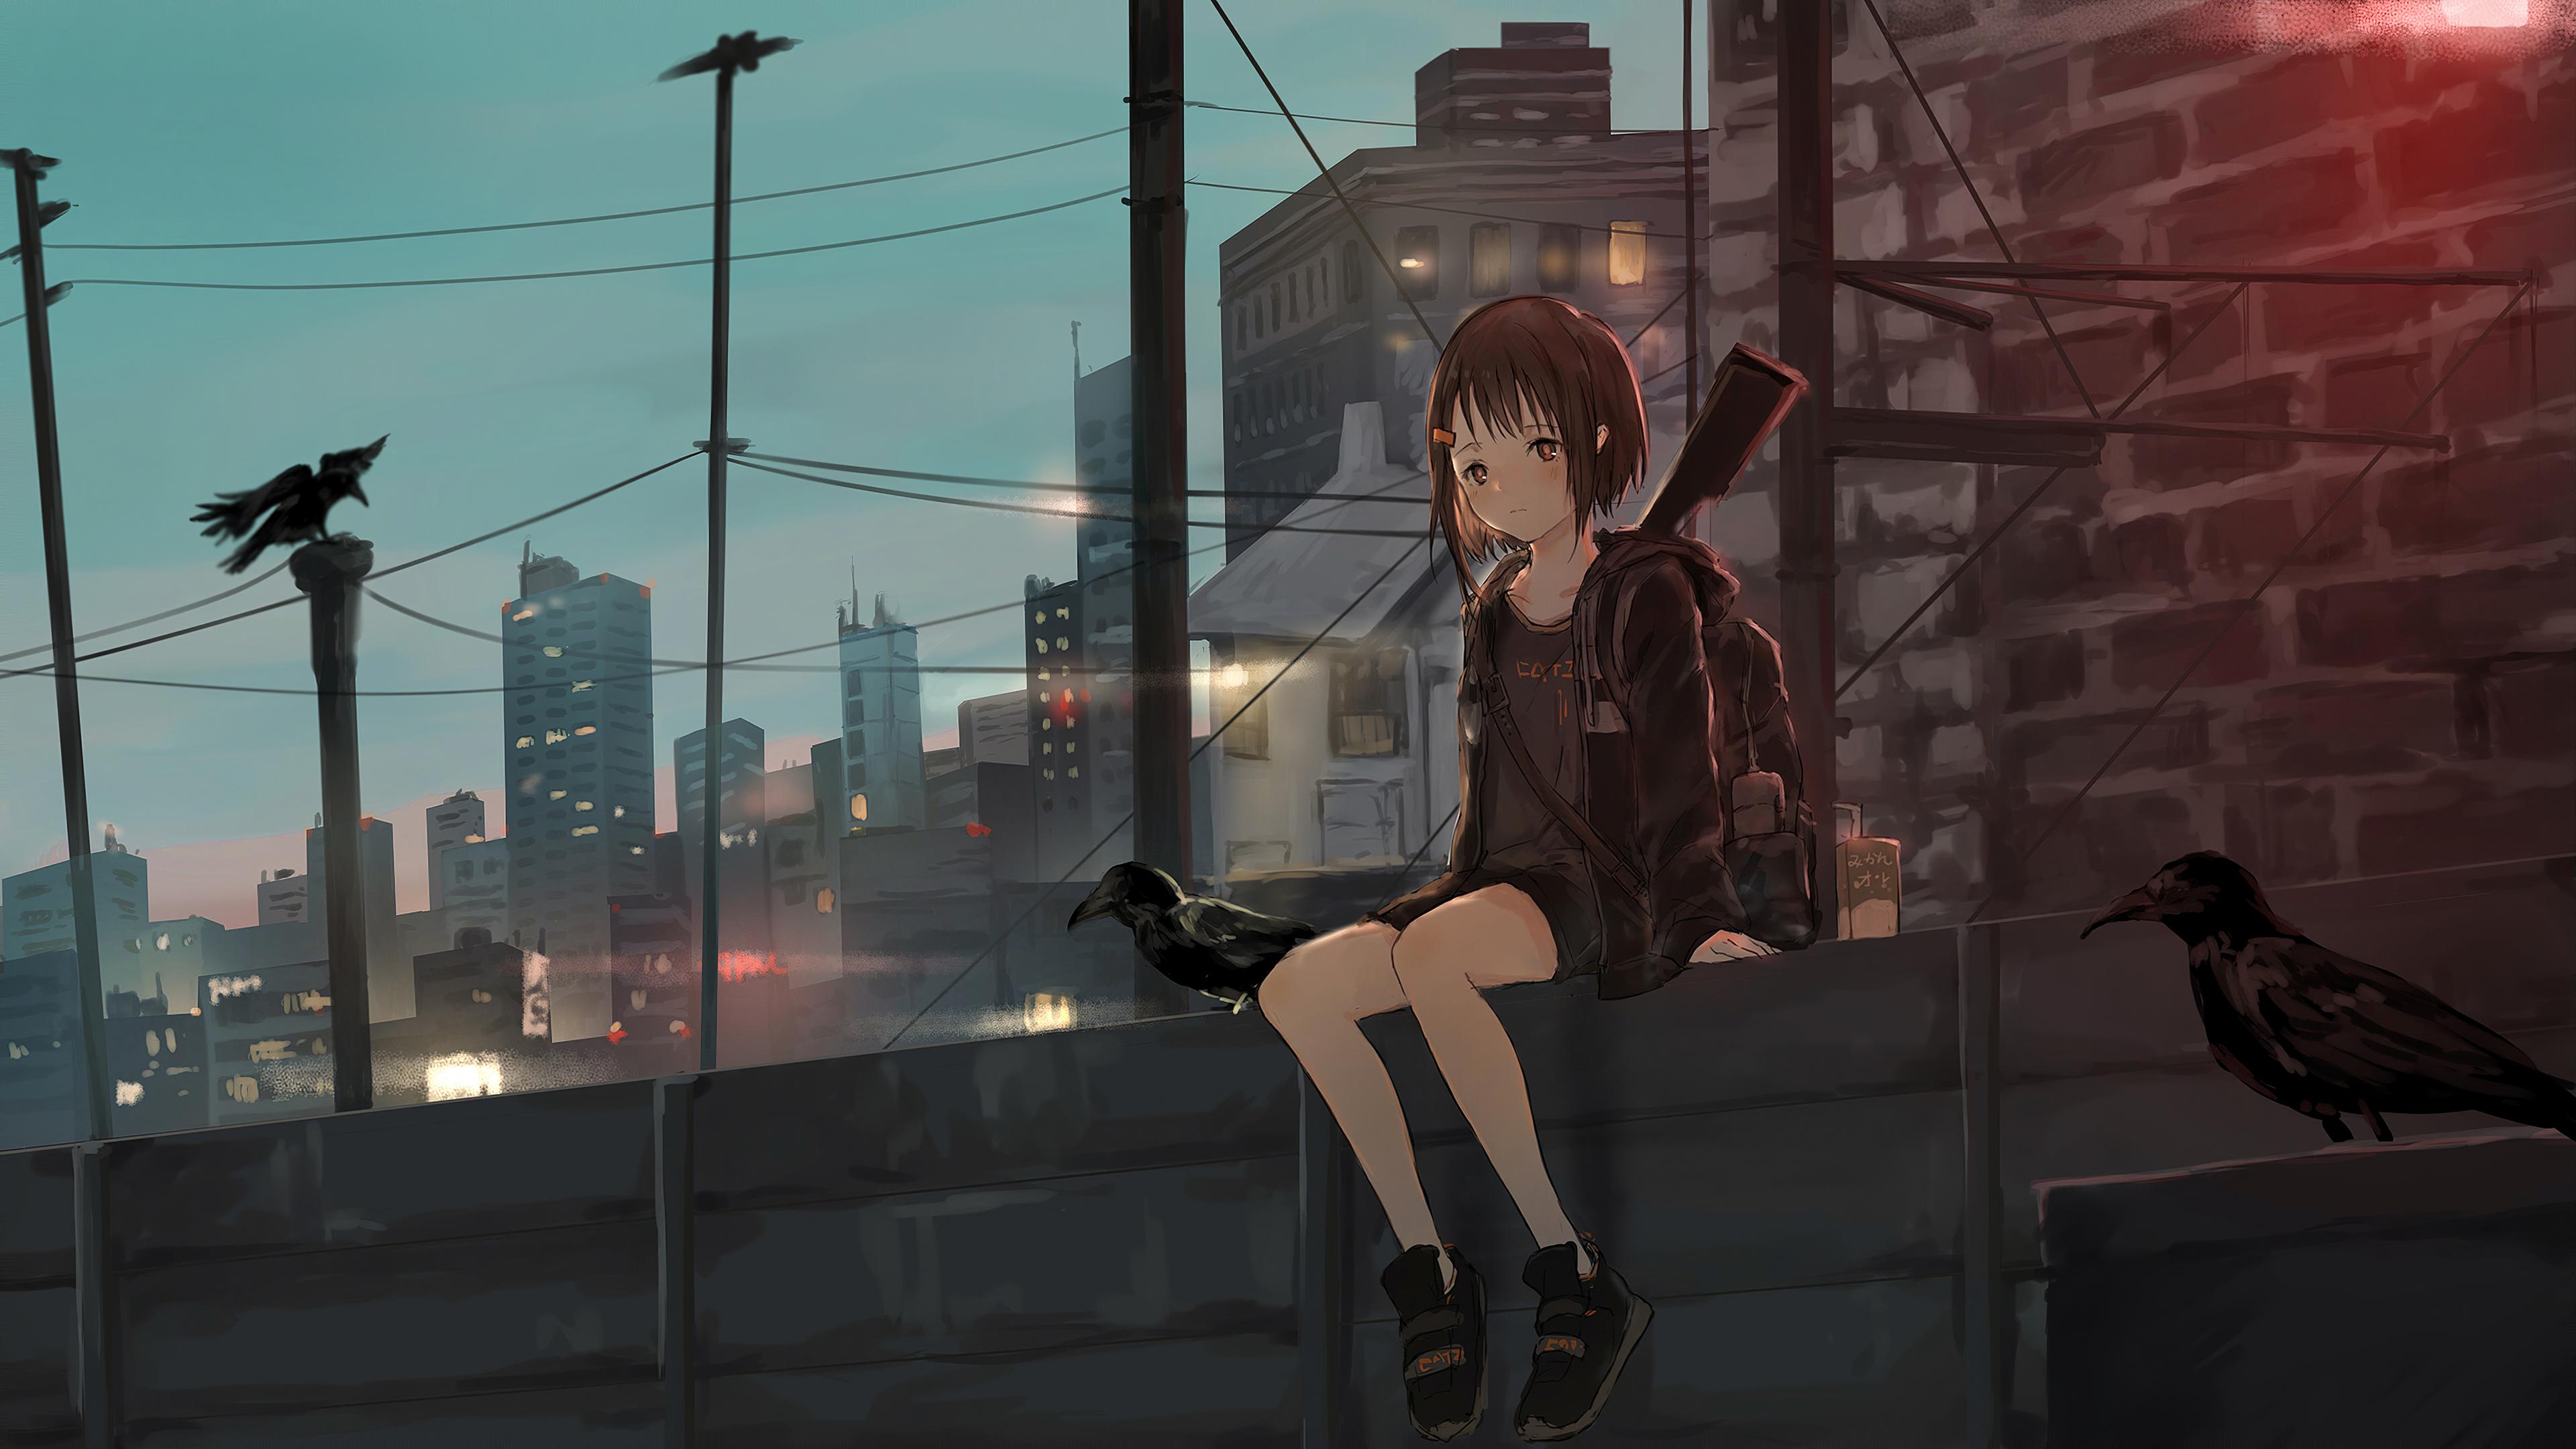 anime girl sitting alone roof sad 1578254264 - Anime Girl Sitting Alone Roof Sad -